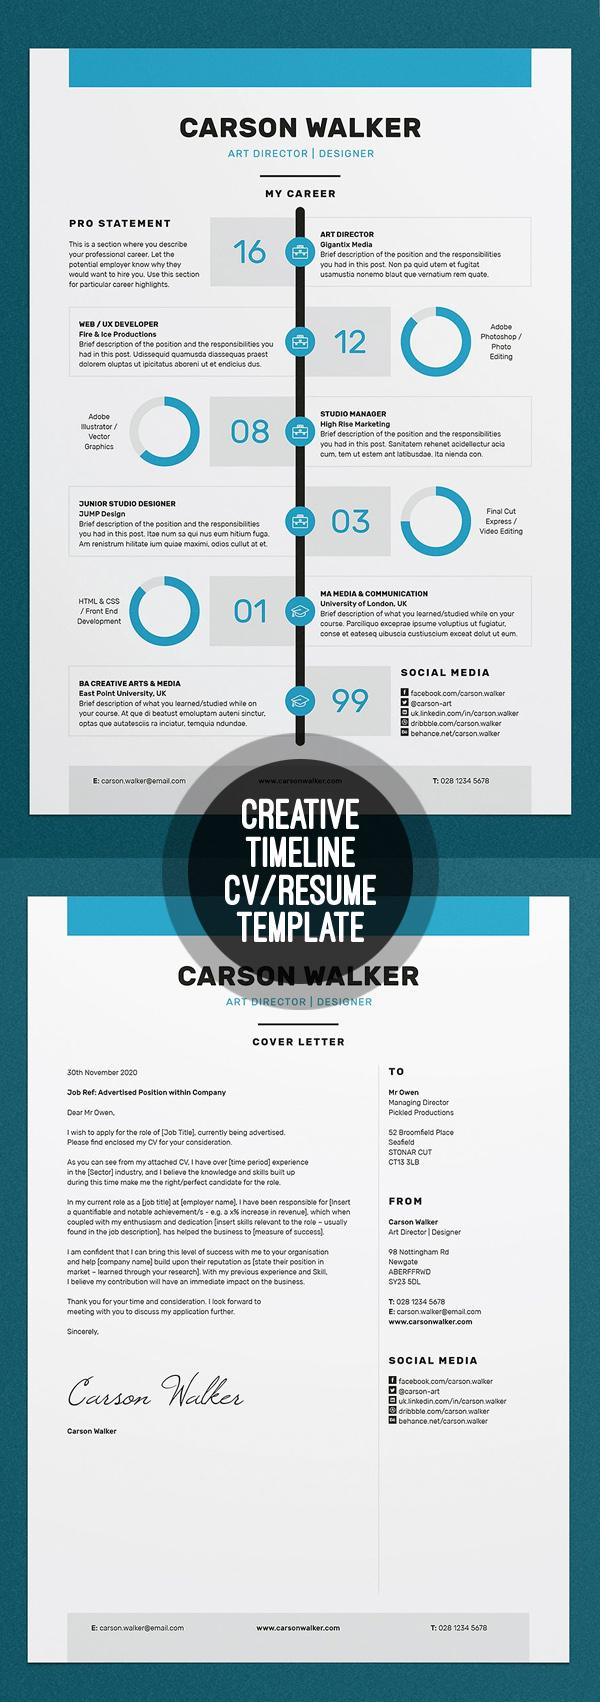 Creative Timeline Resume/CV Template